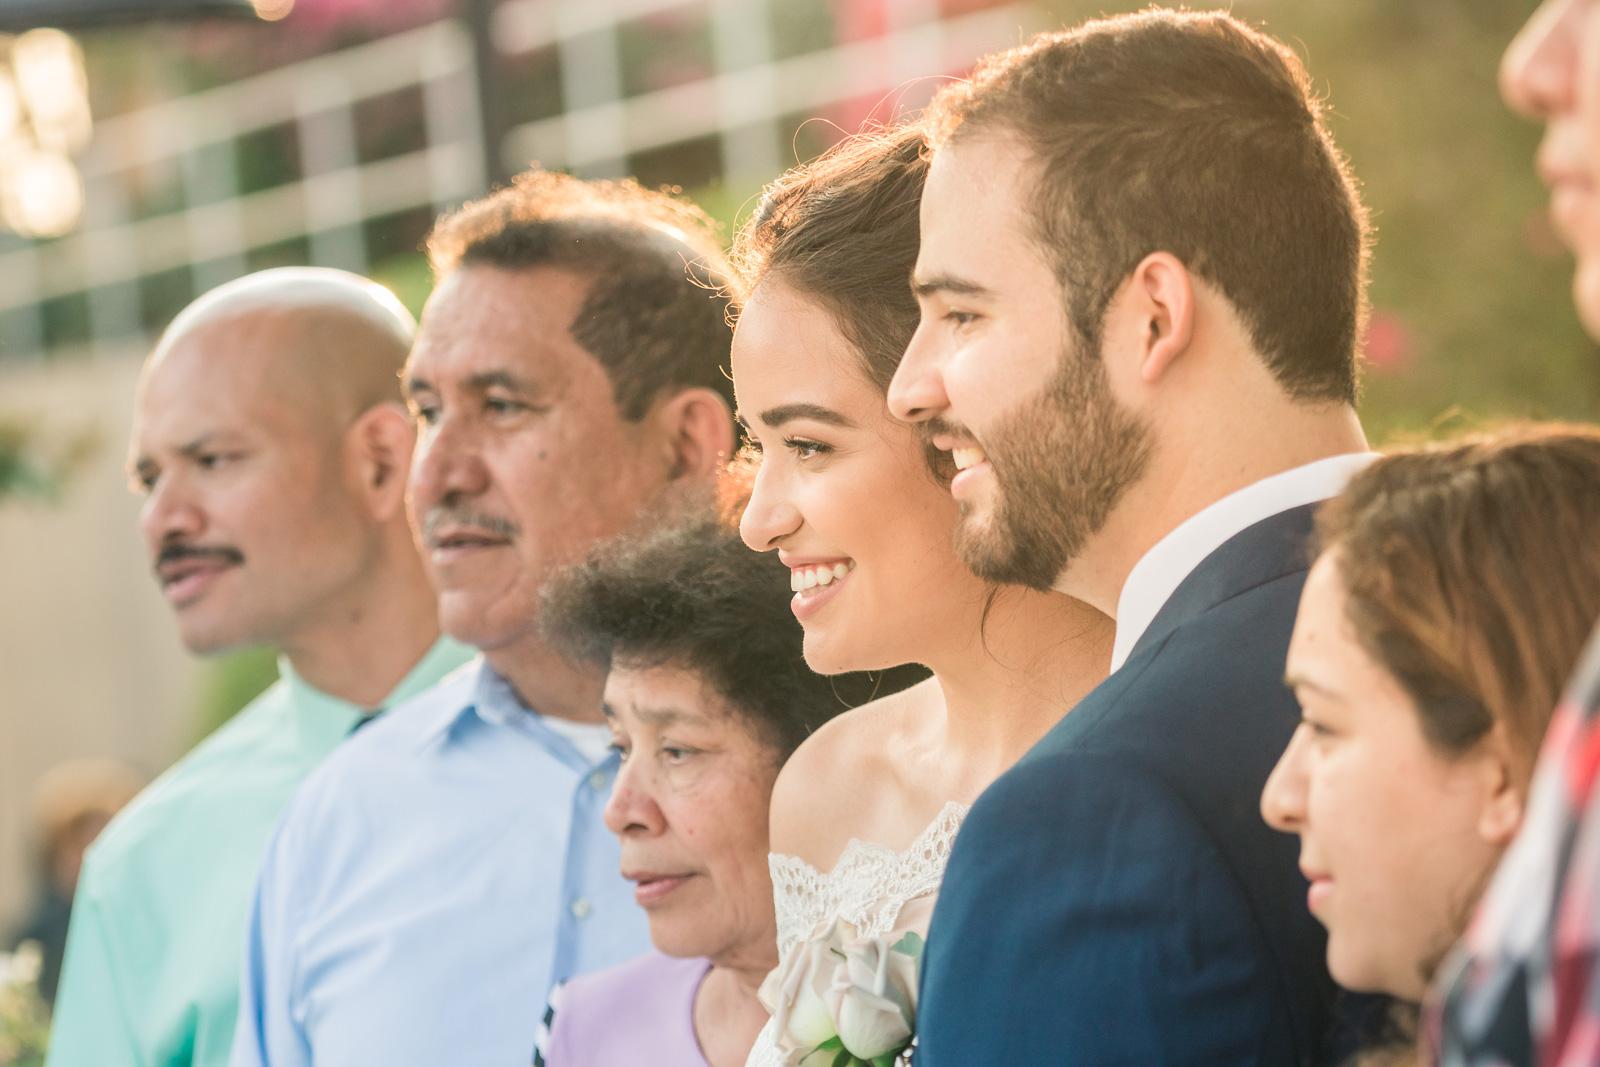 295_Angel-Brea-Orange-County_Joseph-Barber-Wedding-Photography.jpg